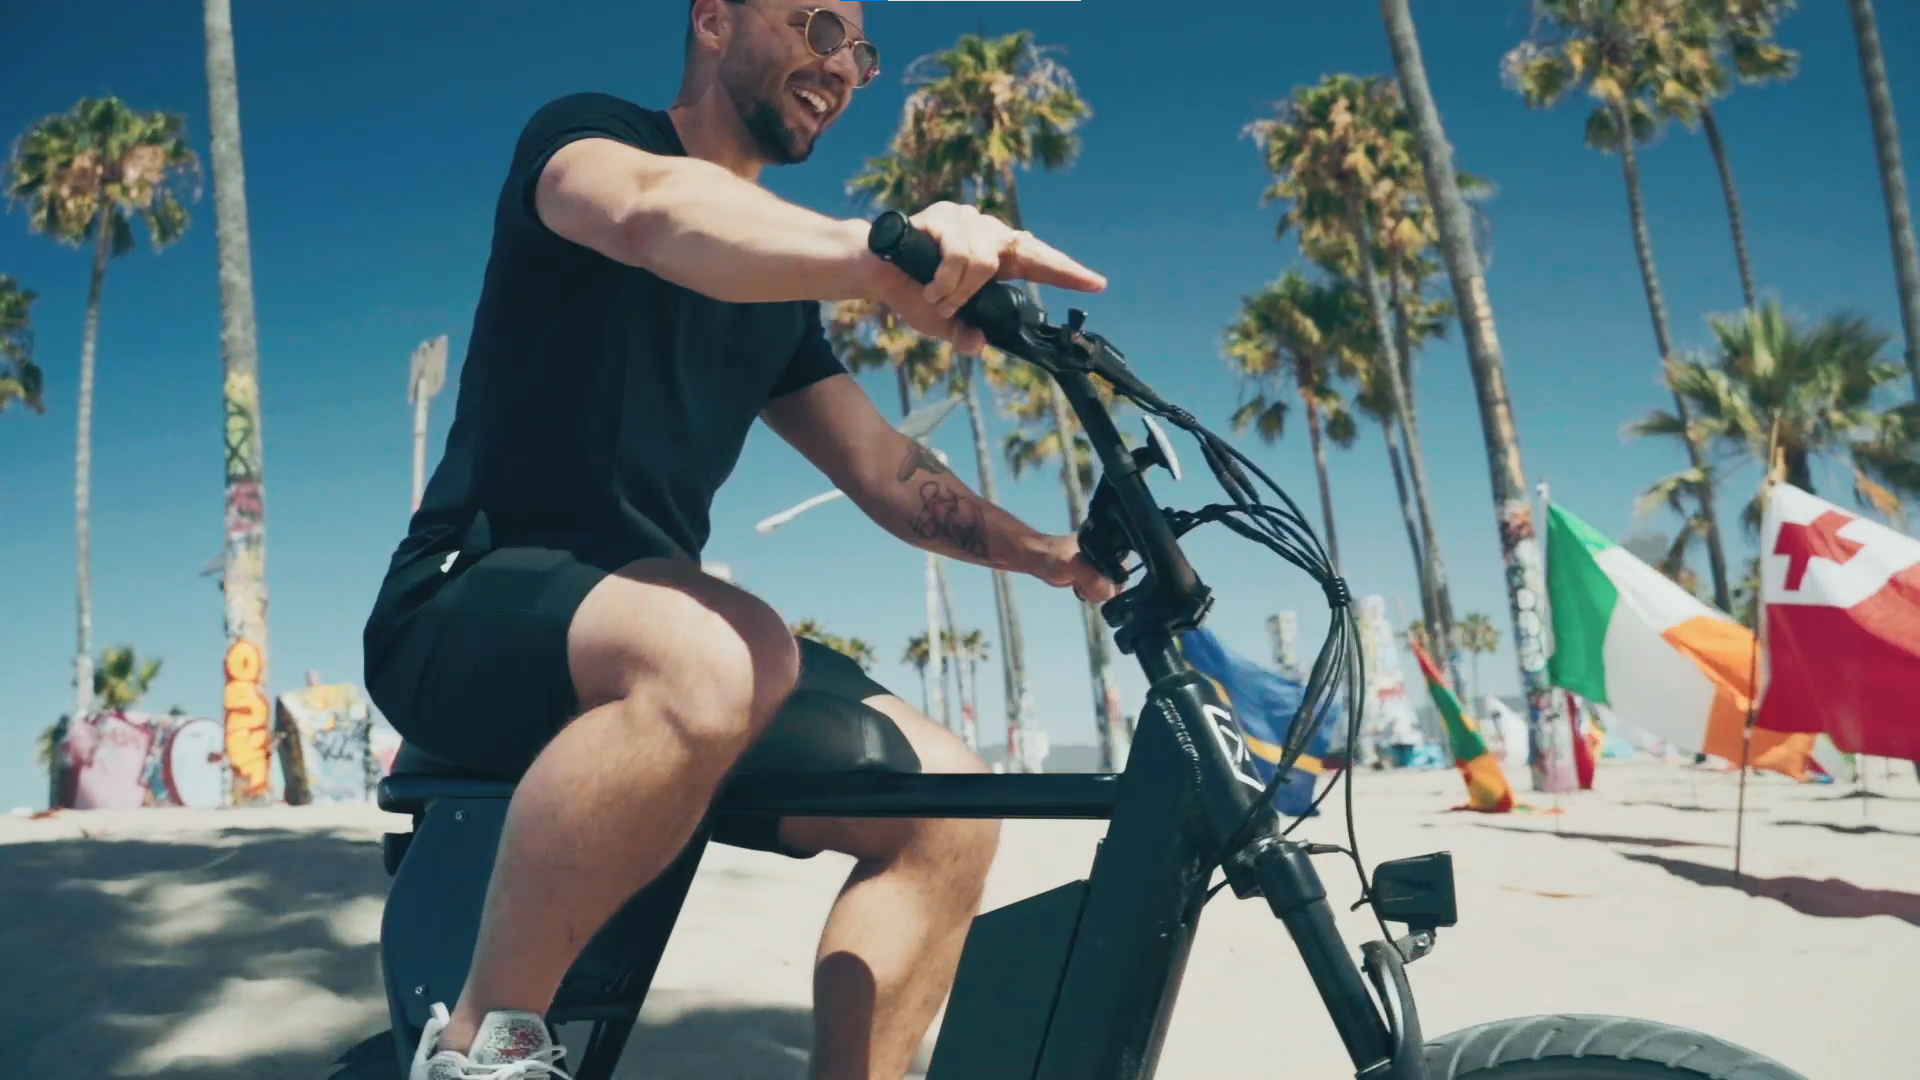 Juiced Bikes affordable Scrambler e-bike